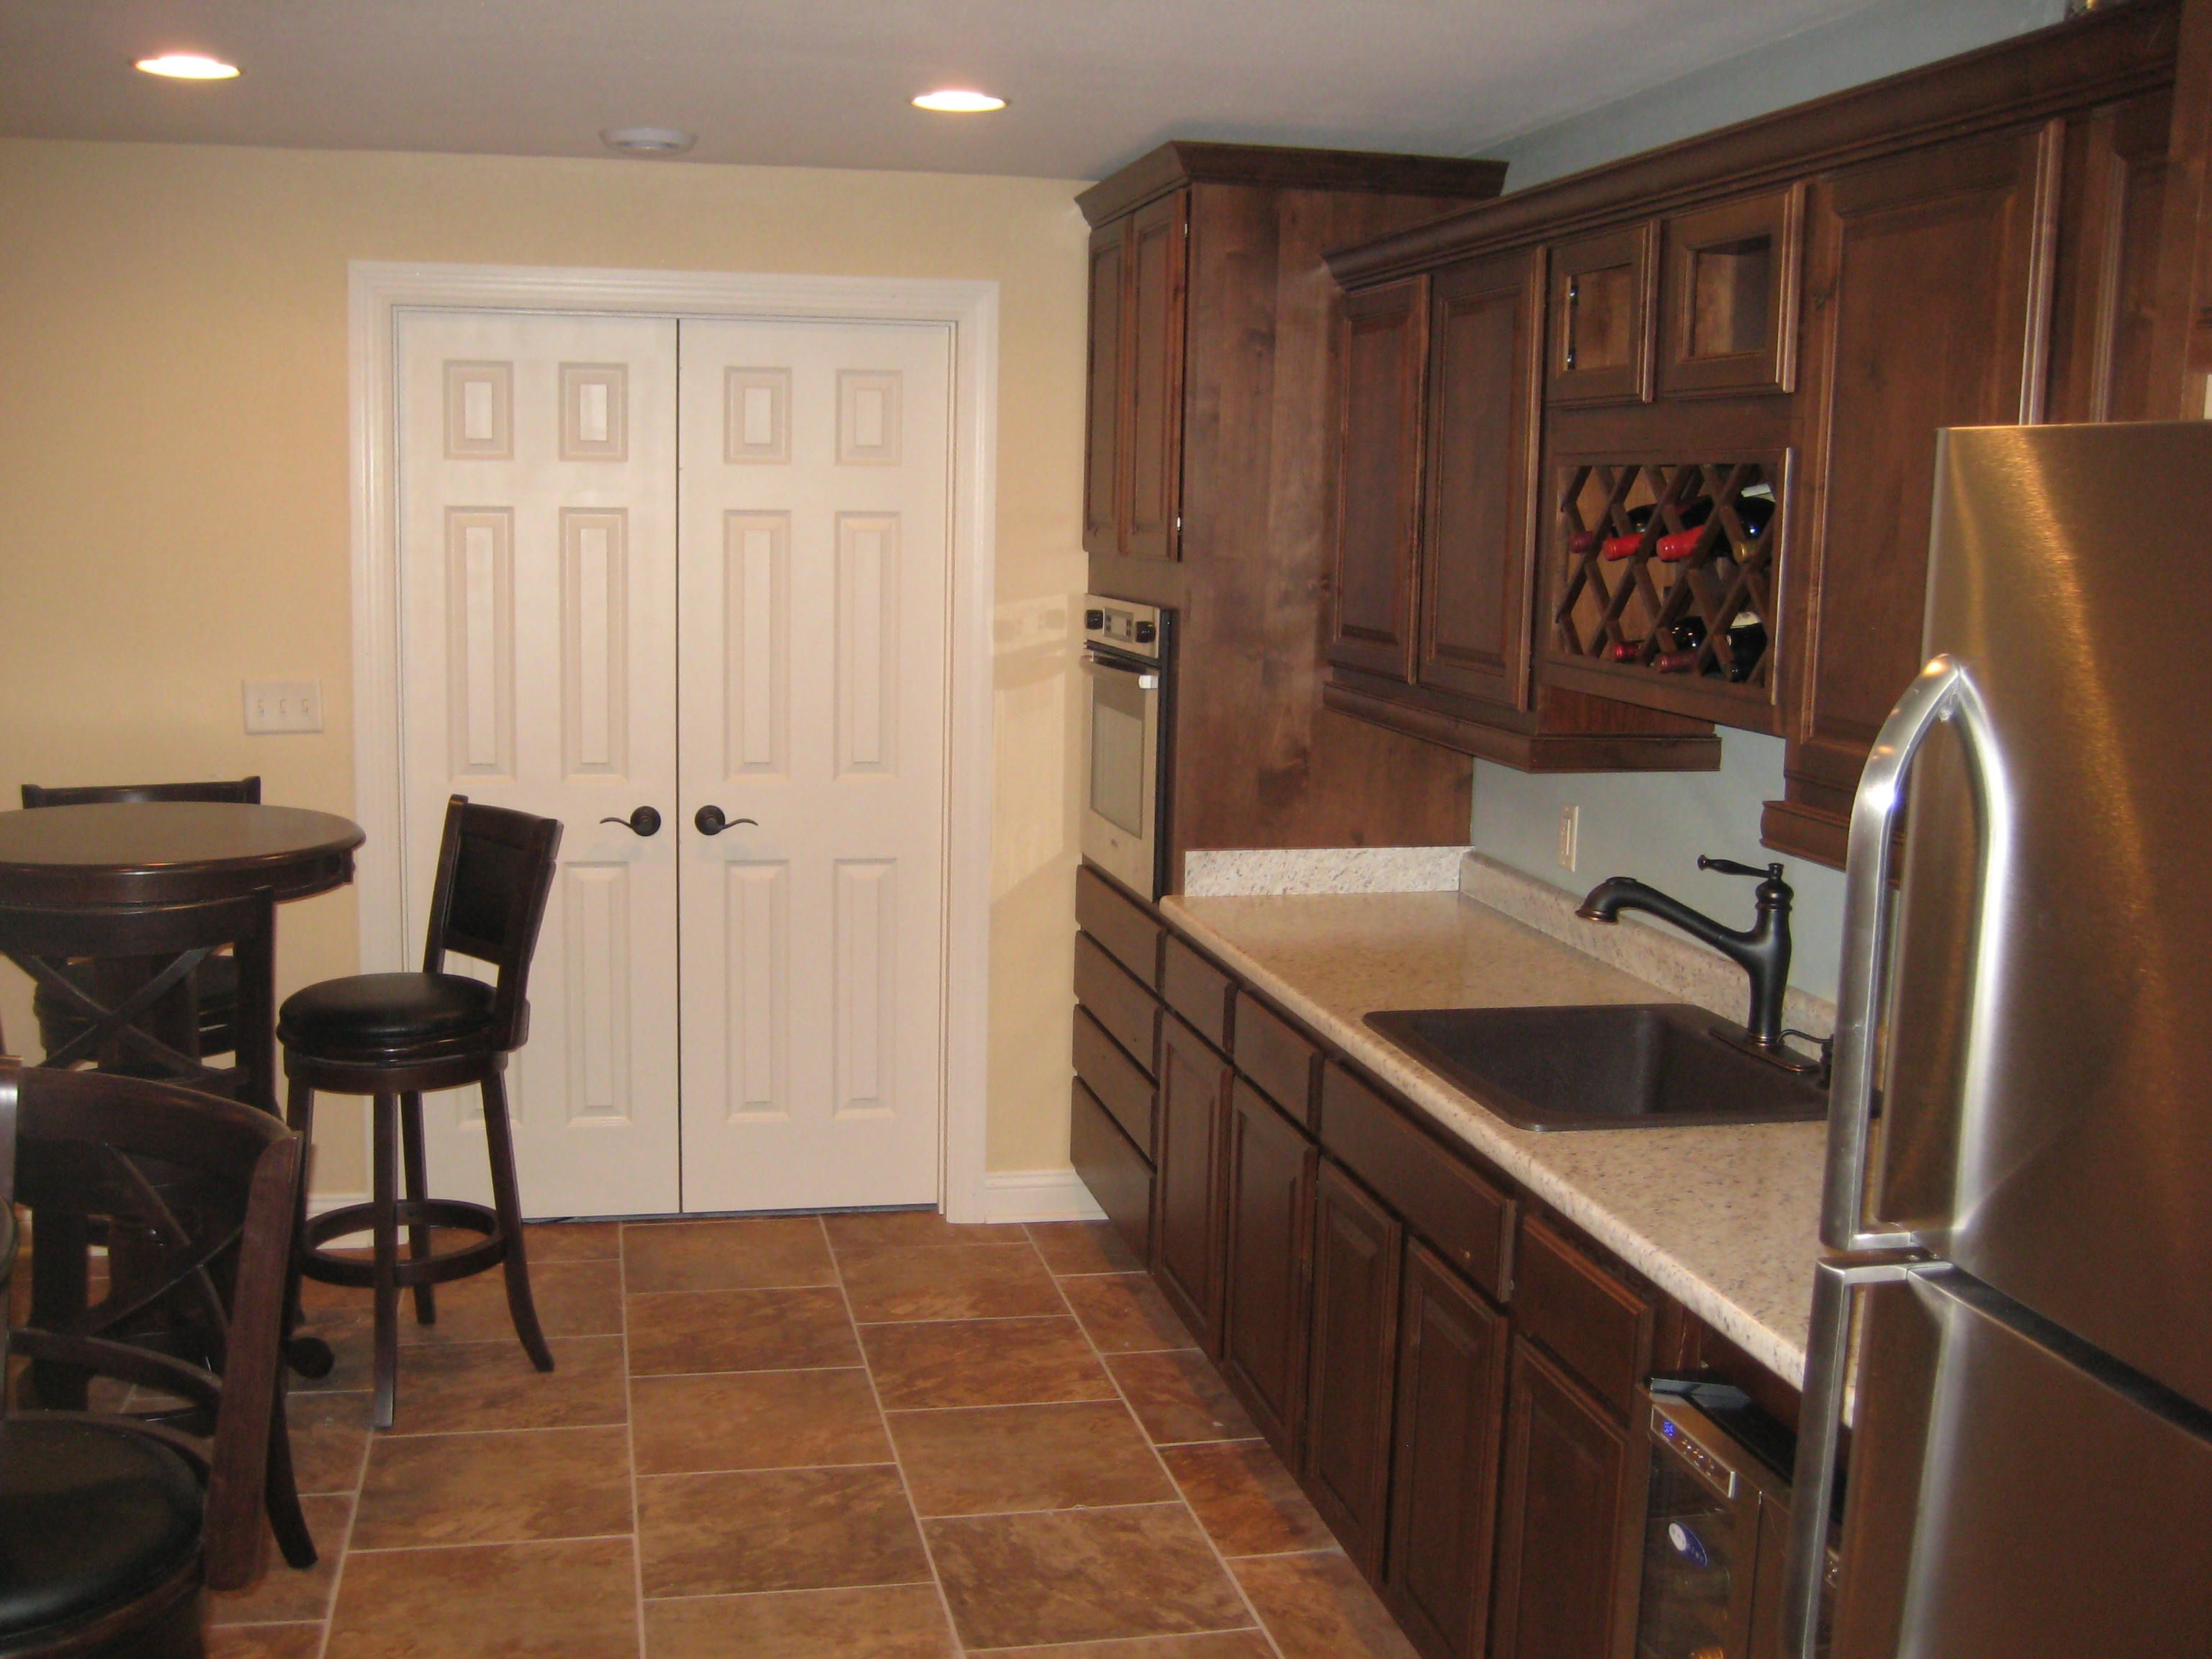 Basement Kitchen For The Home Pinterest Basement